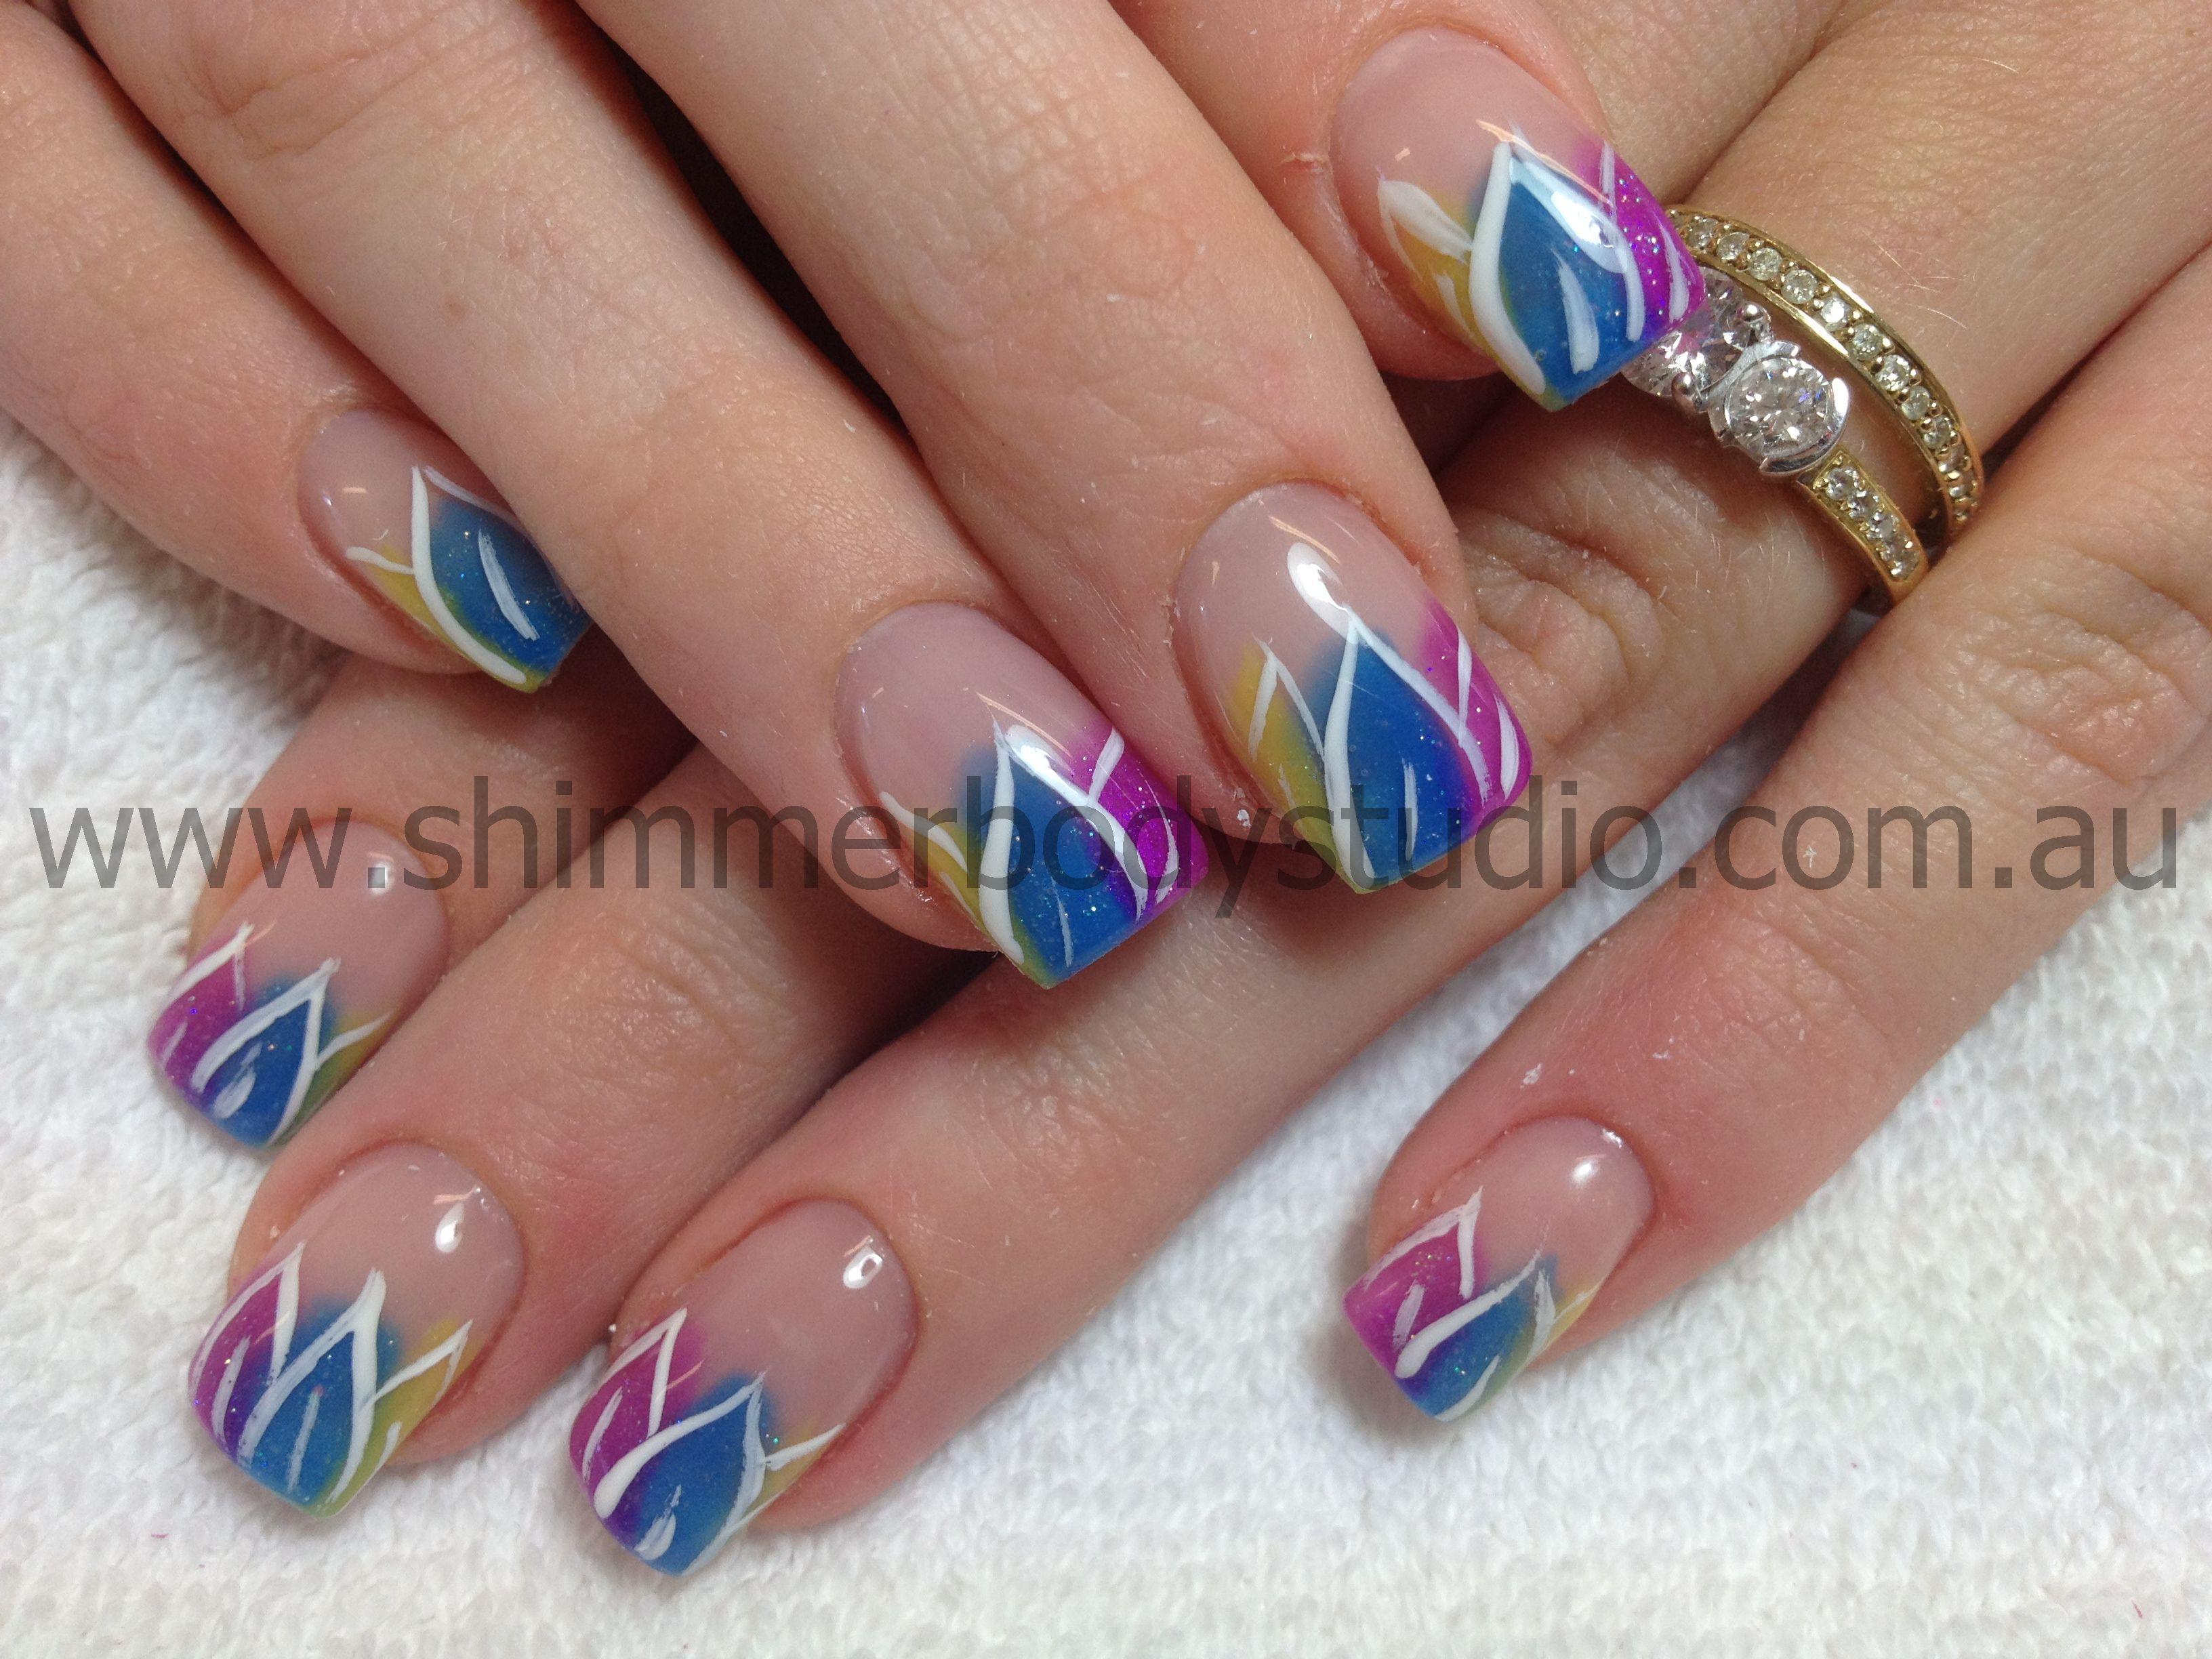 Pin Von Ashley Dickison Auf Nails Colour Or Glitter French Finger